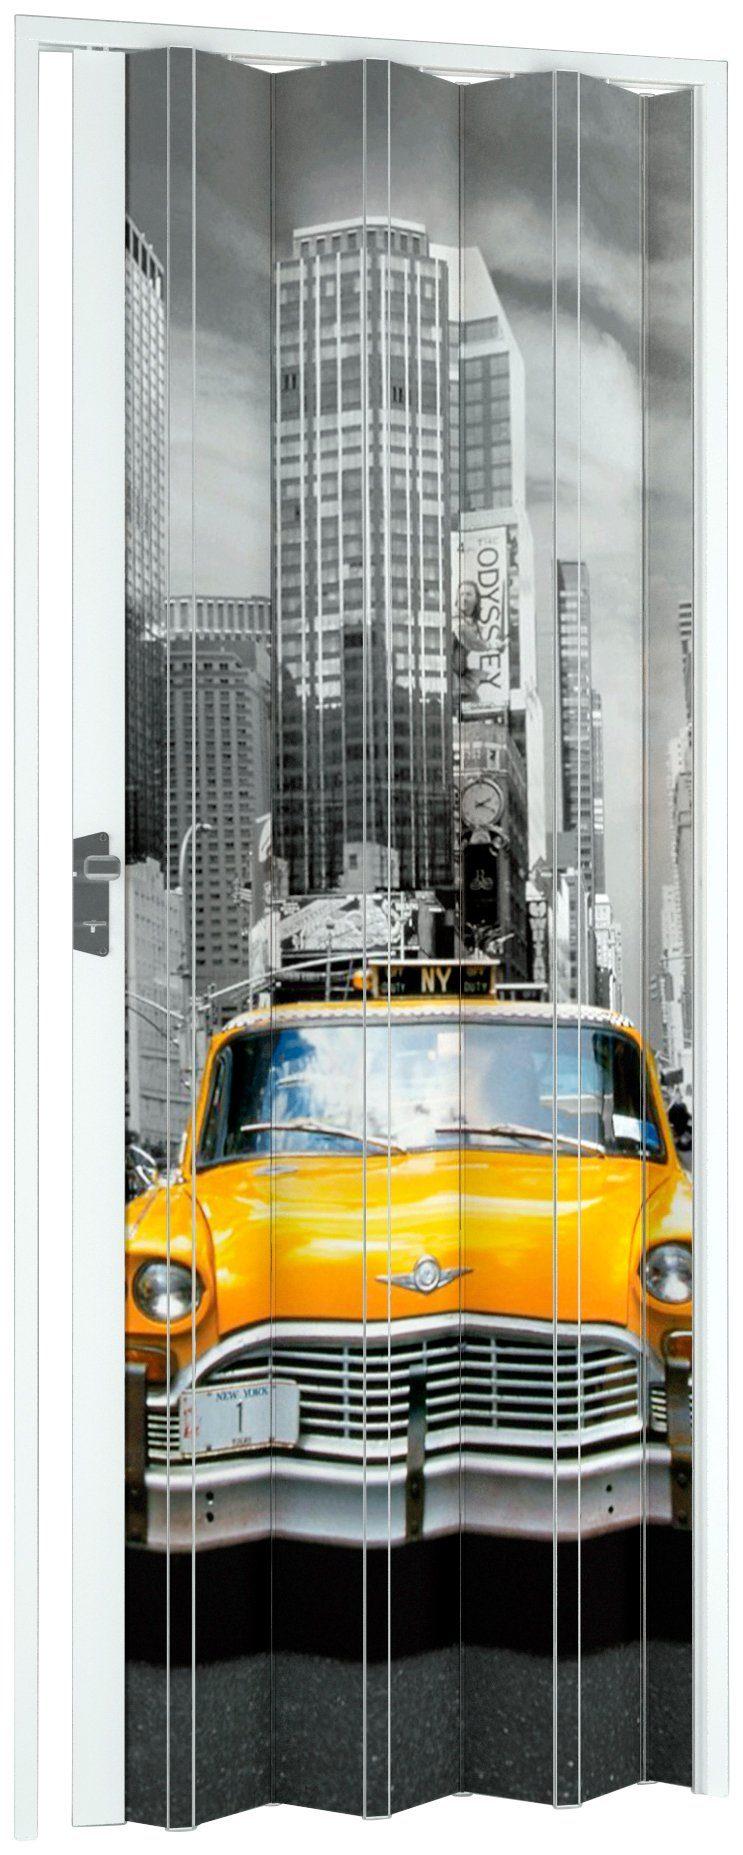 Kunststoff-Falttür »NY-Skyline«, BxH: 88,5x202 cm, Weiß mit Motivdruck